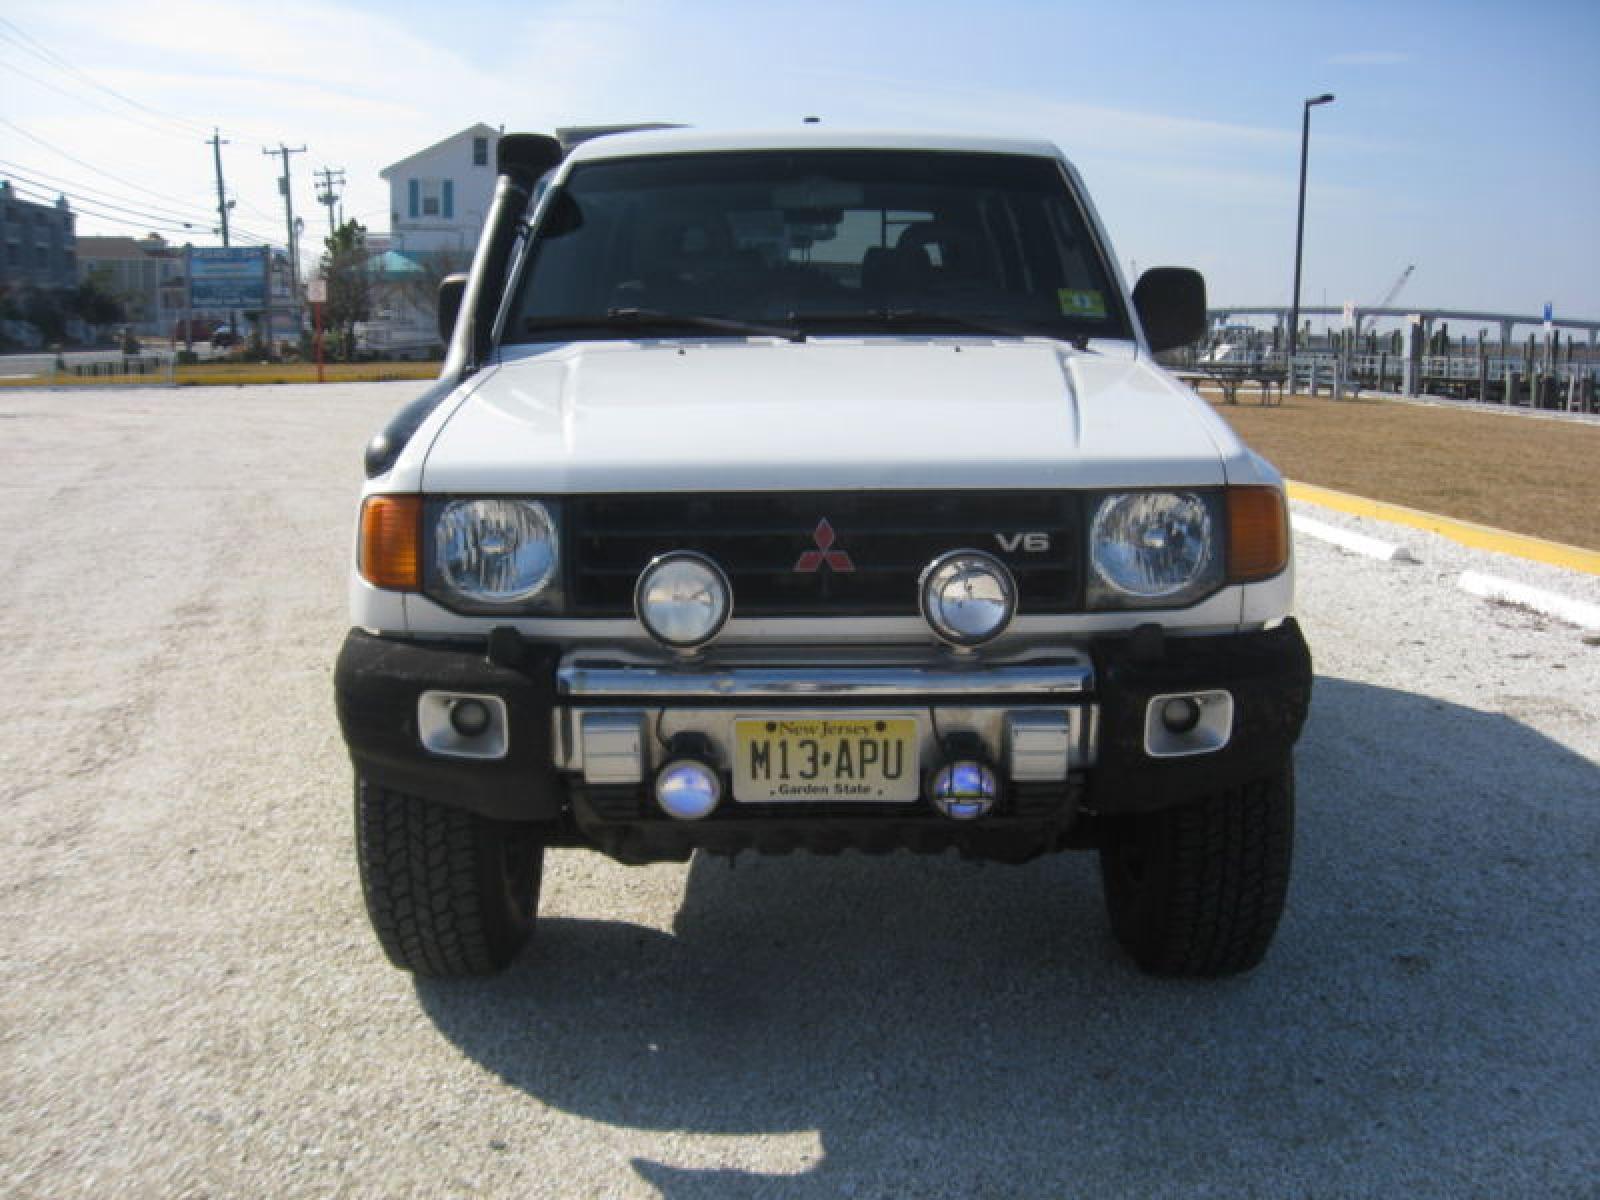 1998 Mitsubishi Montero - Information and photos - Zomb Drive